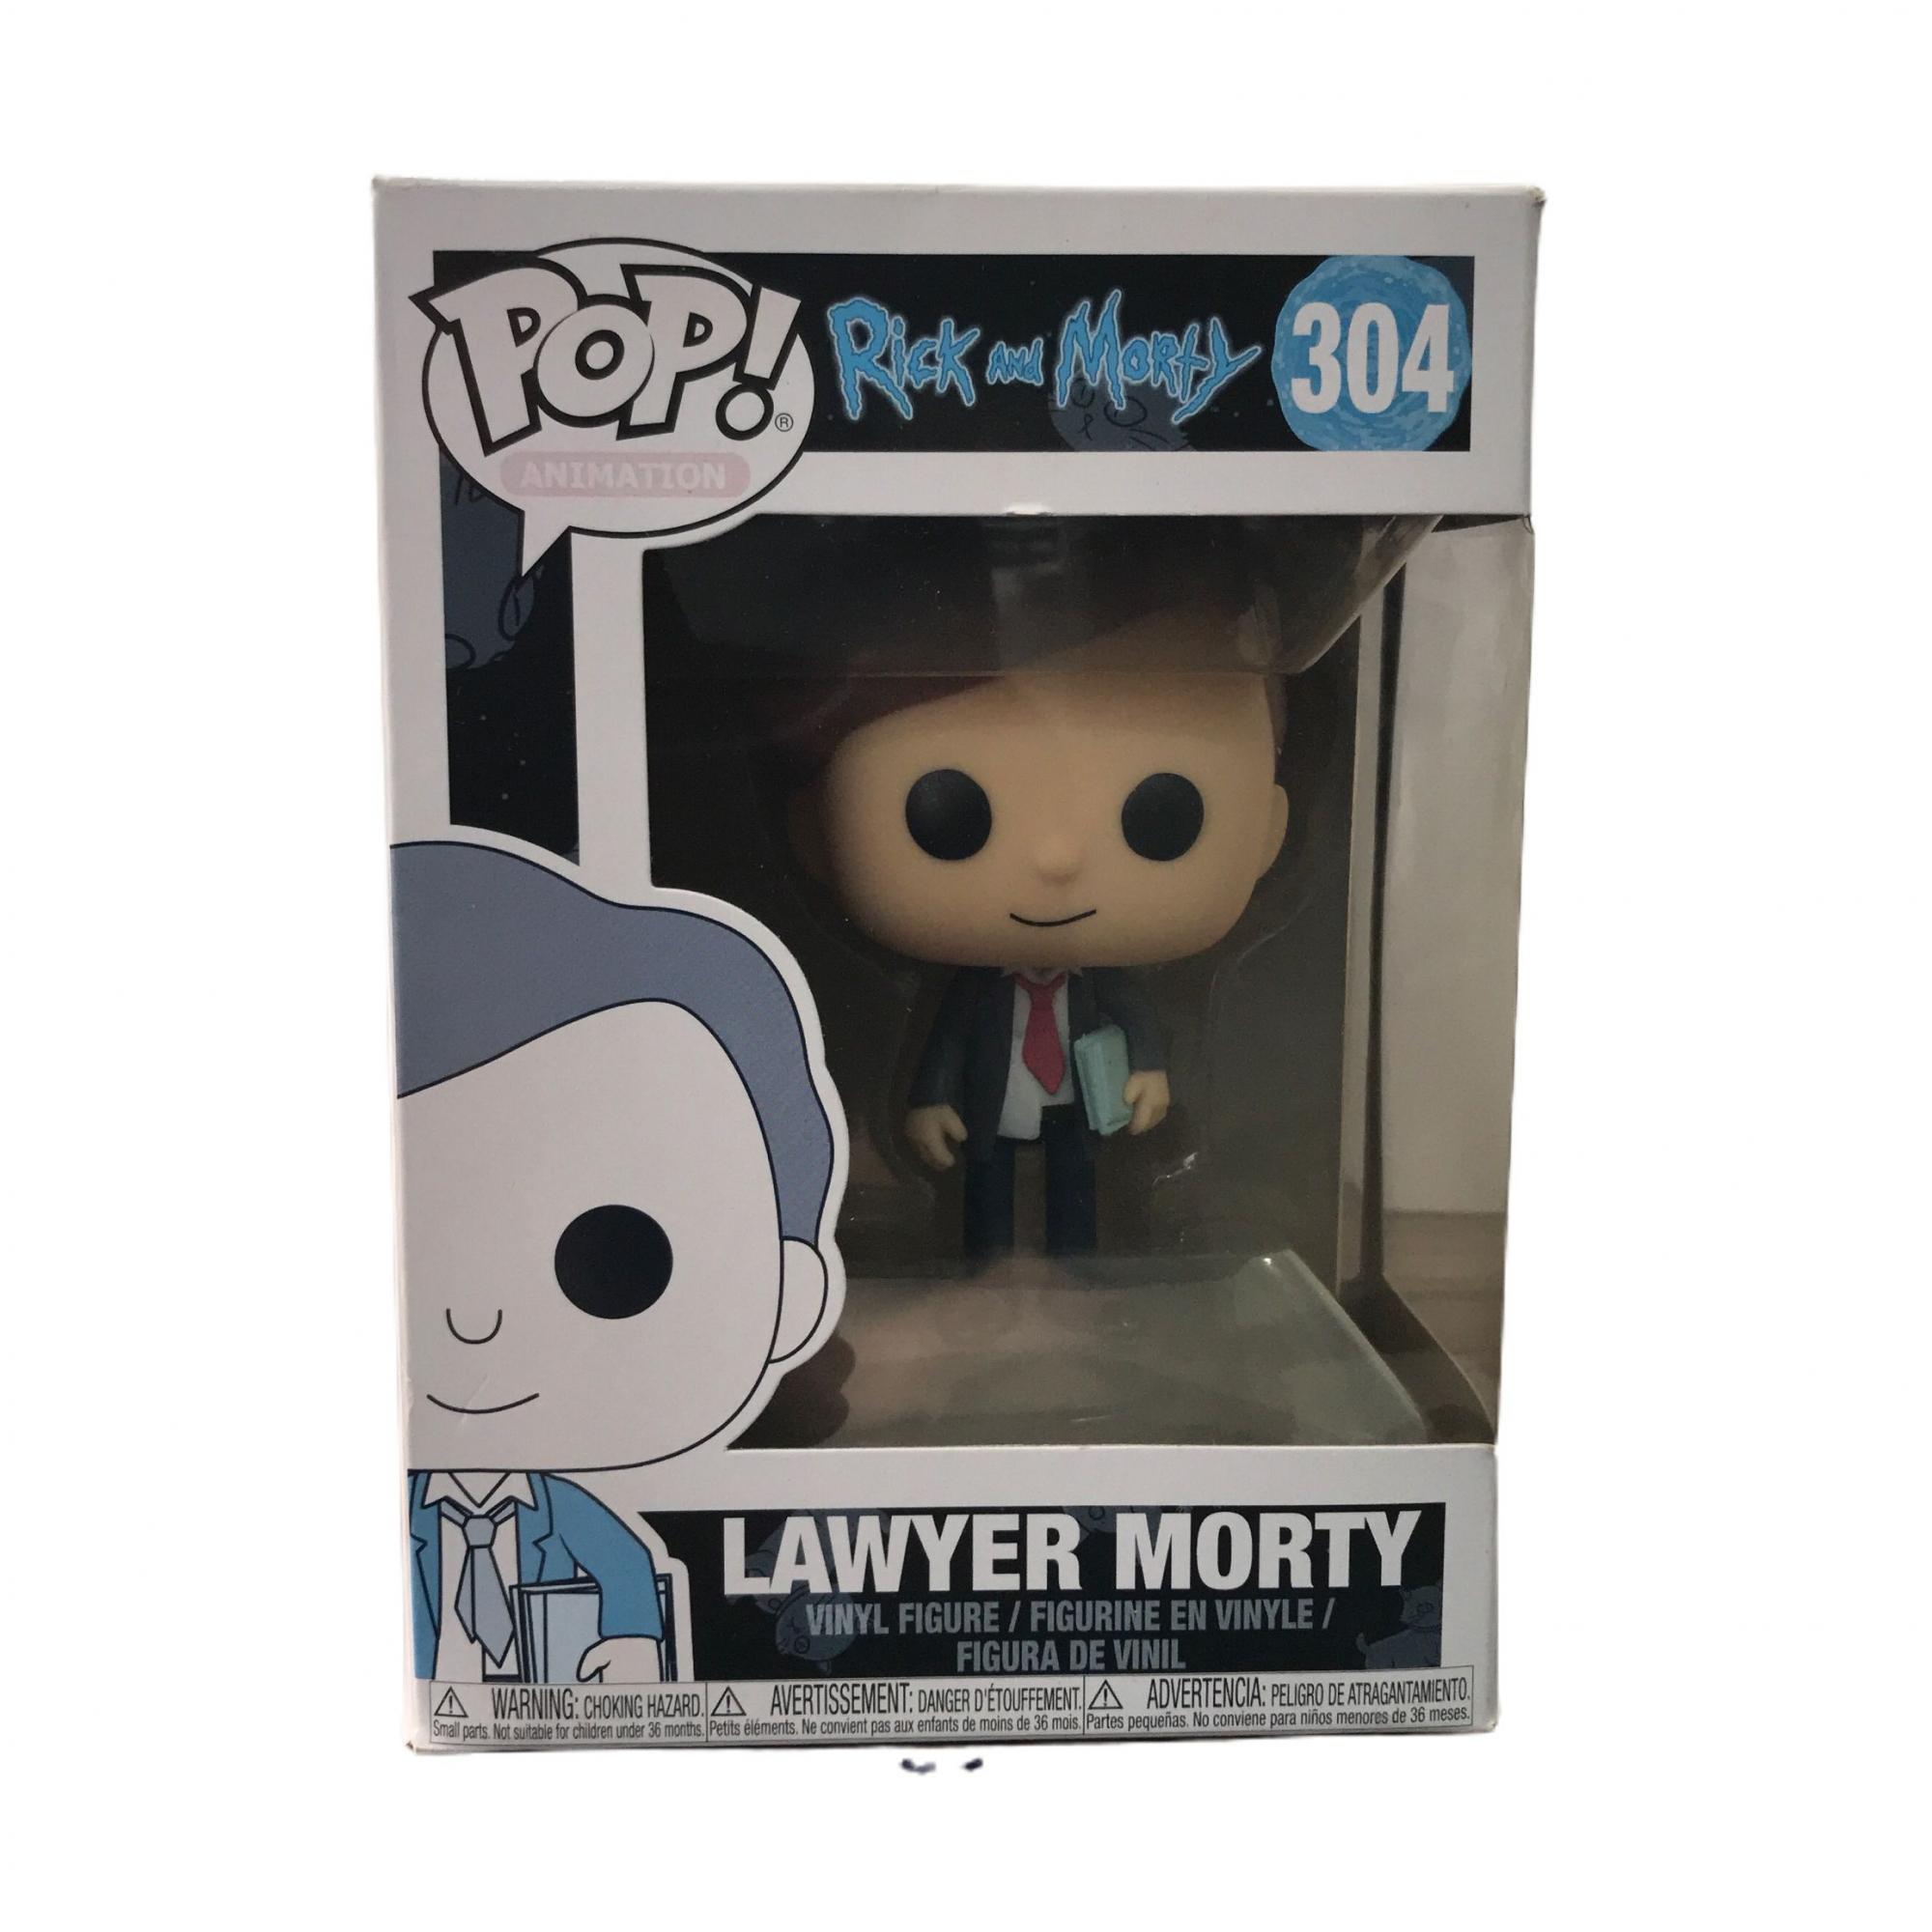 Boneco Funko POP Rick and Morty Lawer Morty Nº 304 (Seminovo)